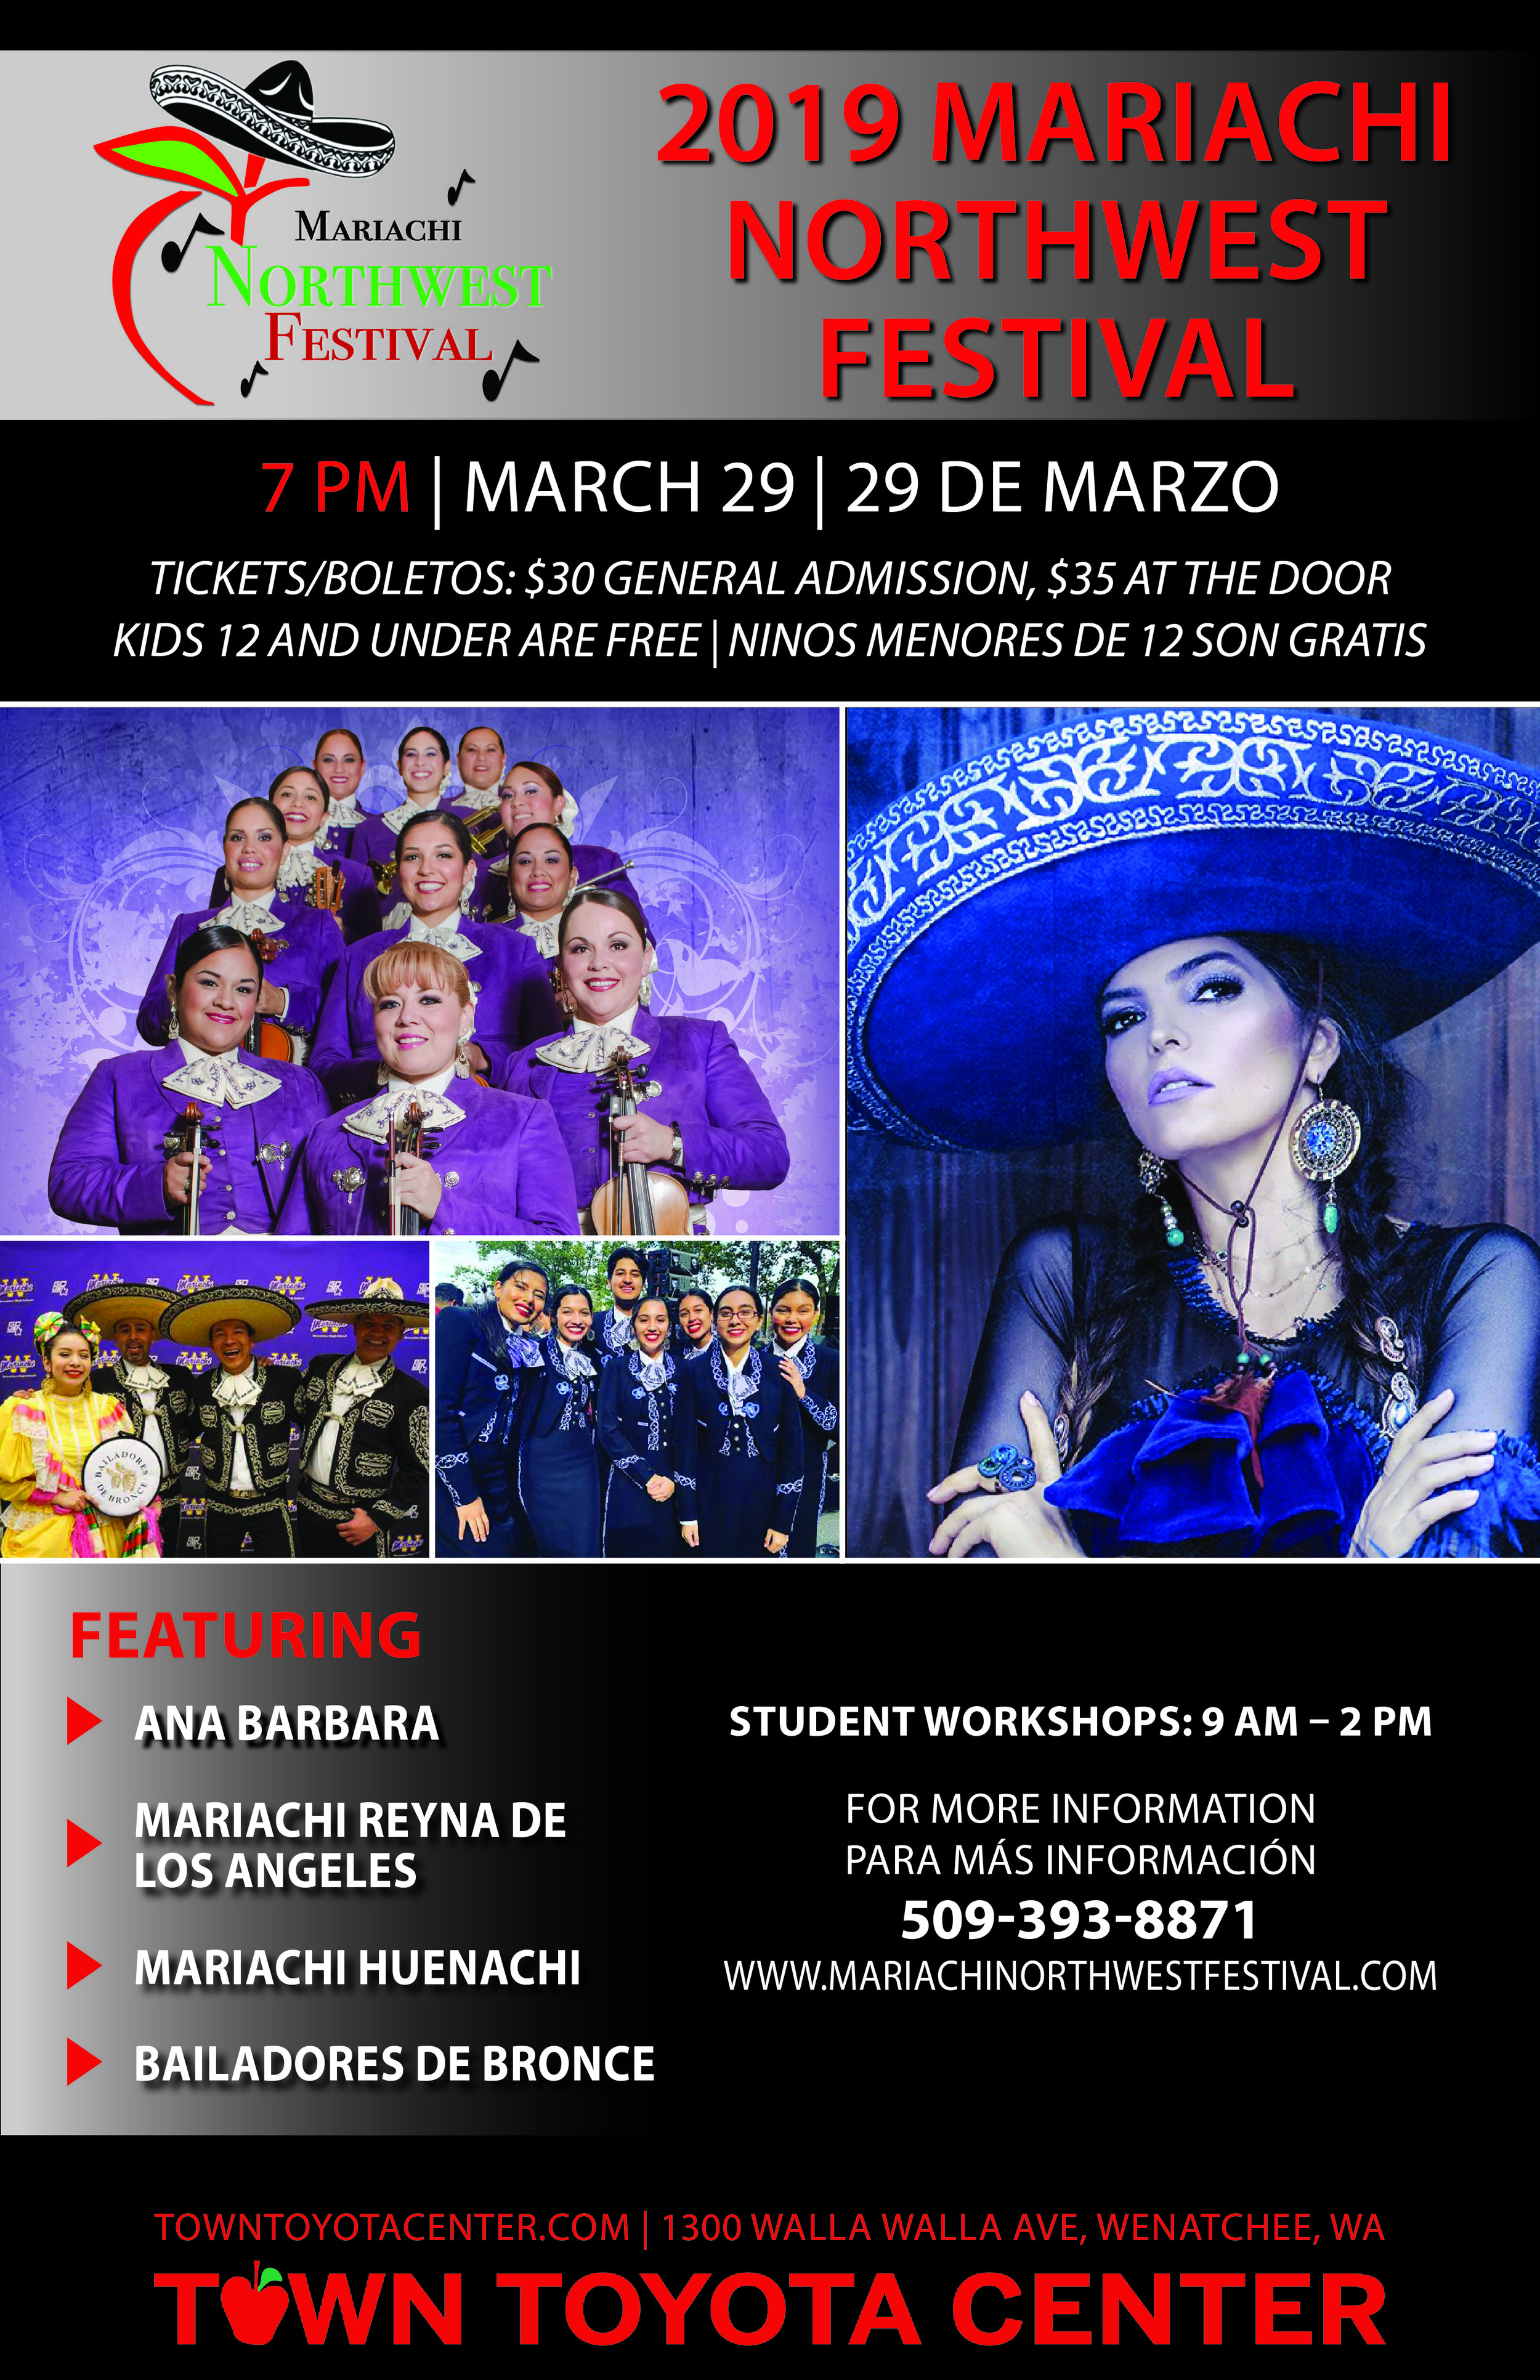 Mariachi Northwest Festival 2019 poster.jpg